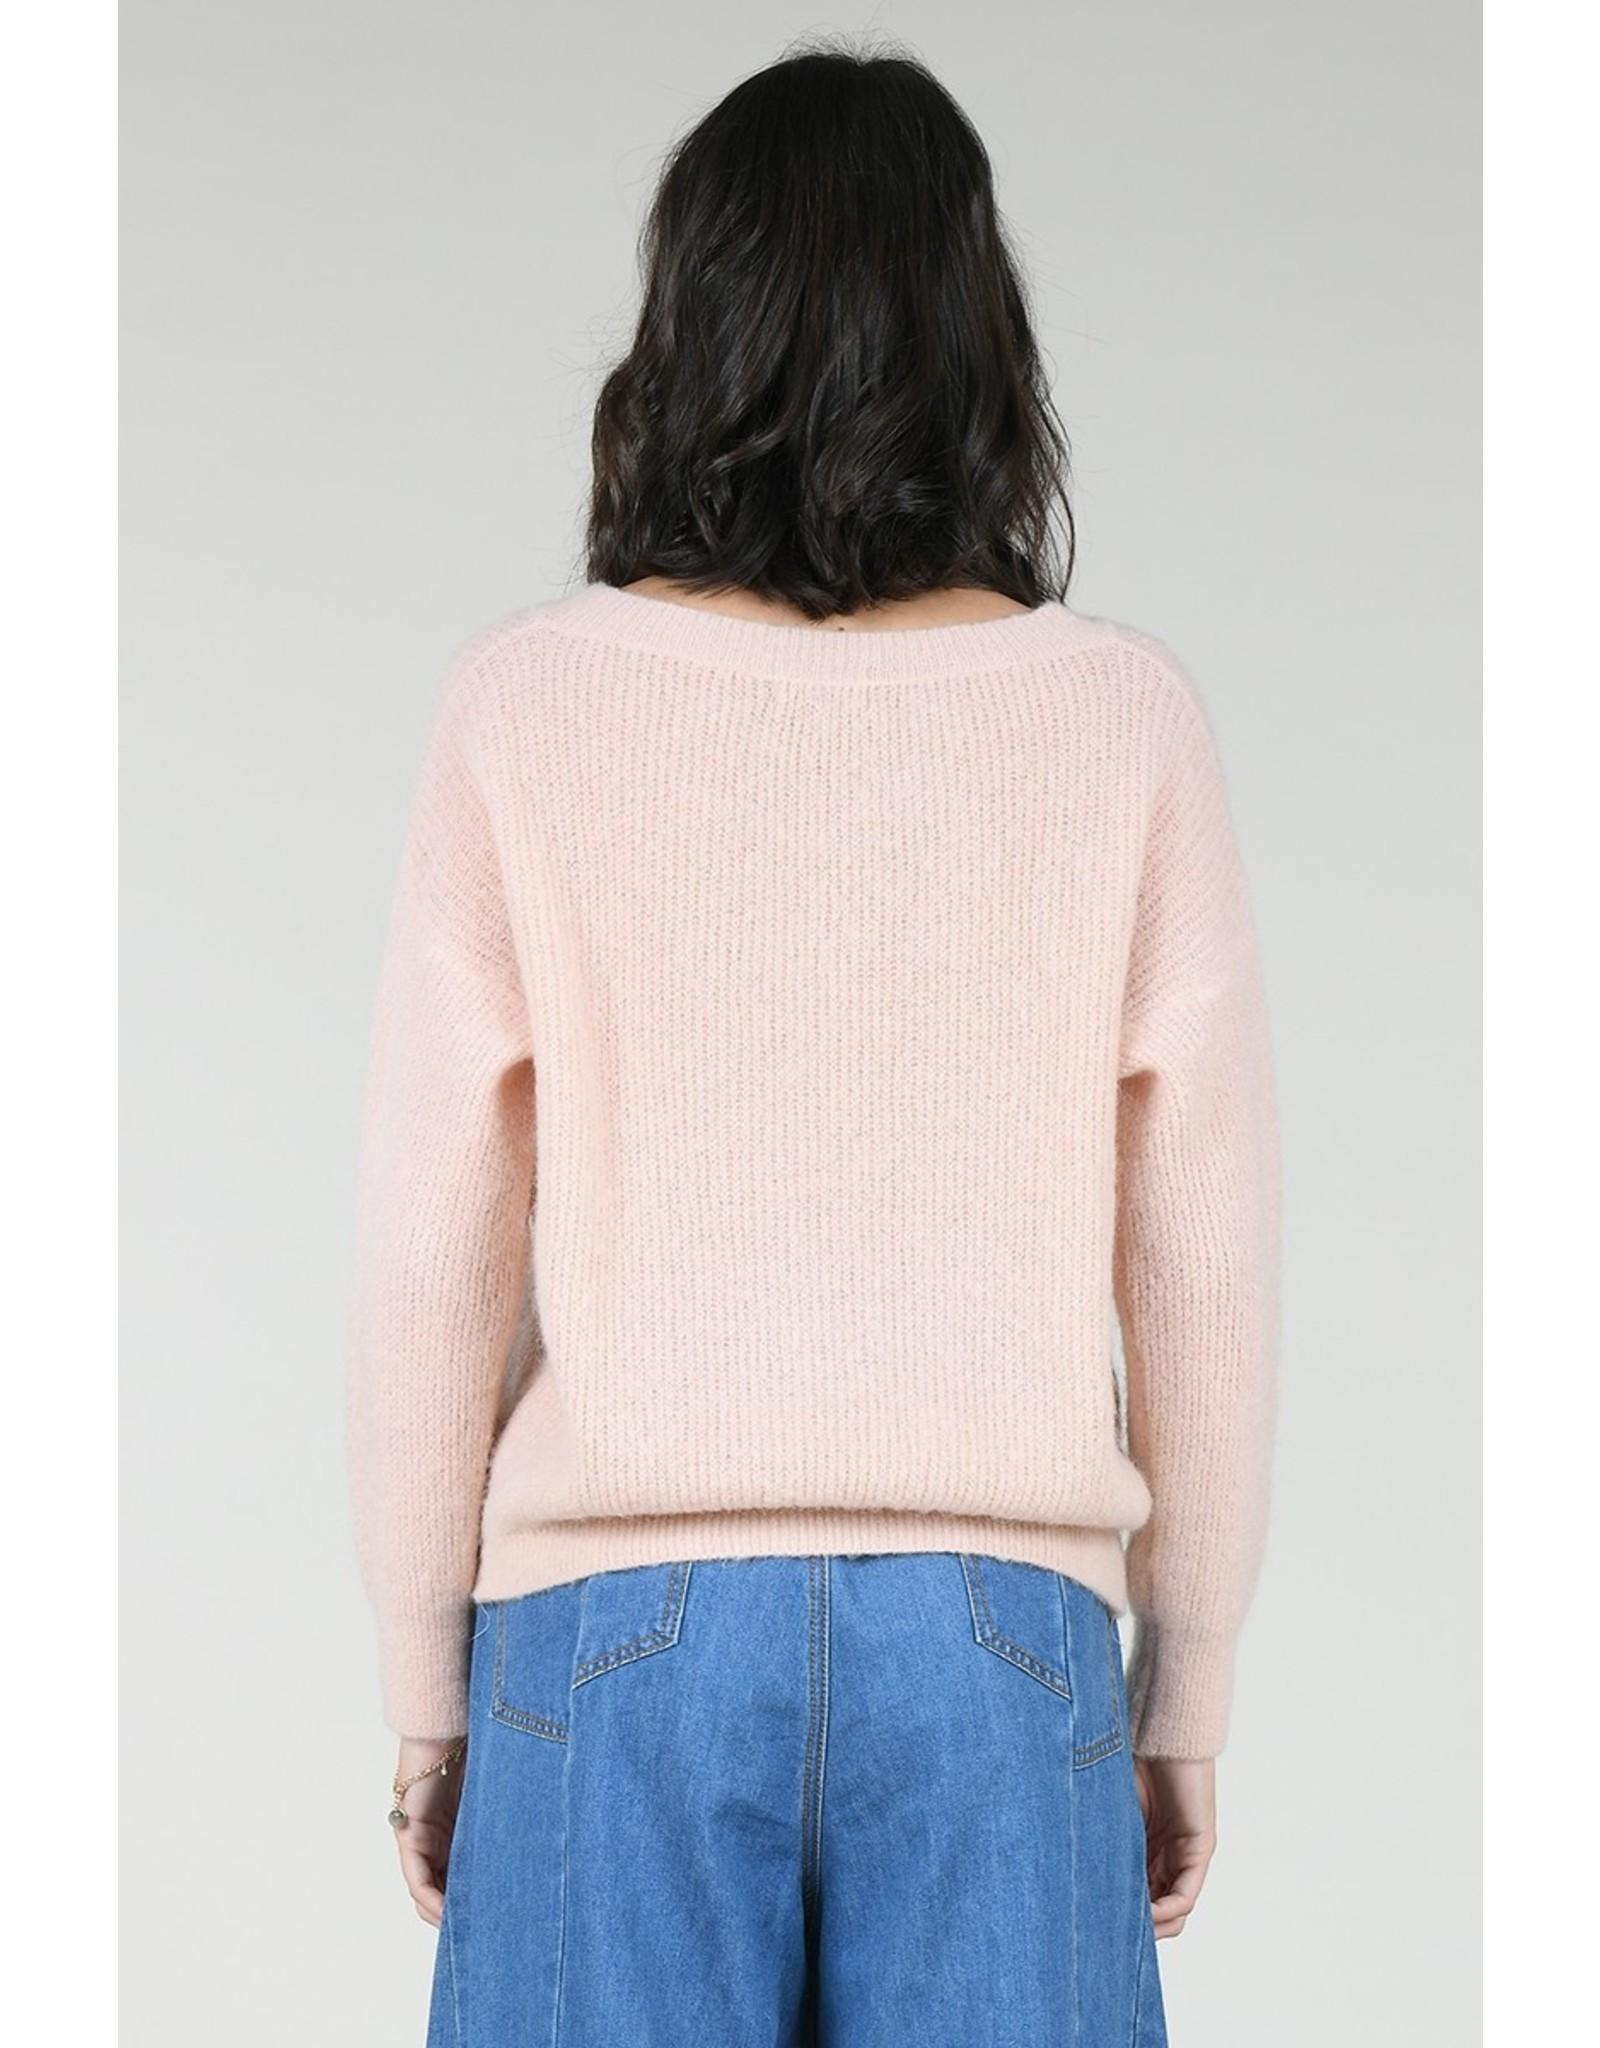 Molly Bracken Molly Bracken - Soft peach V-neck sweater